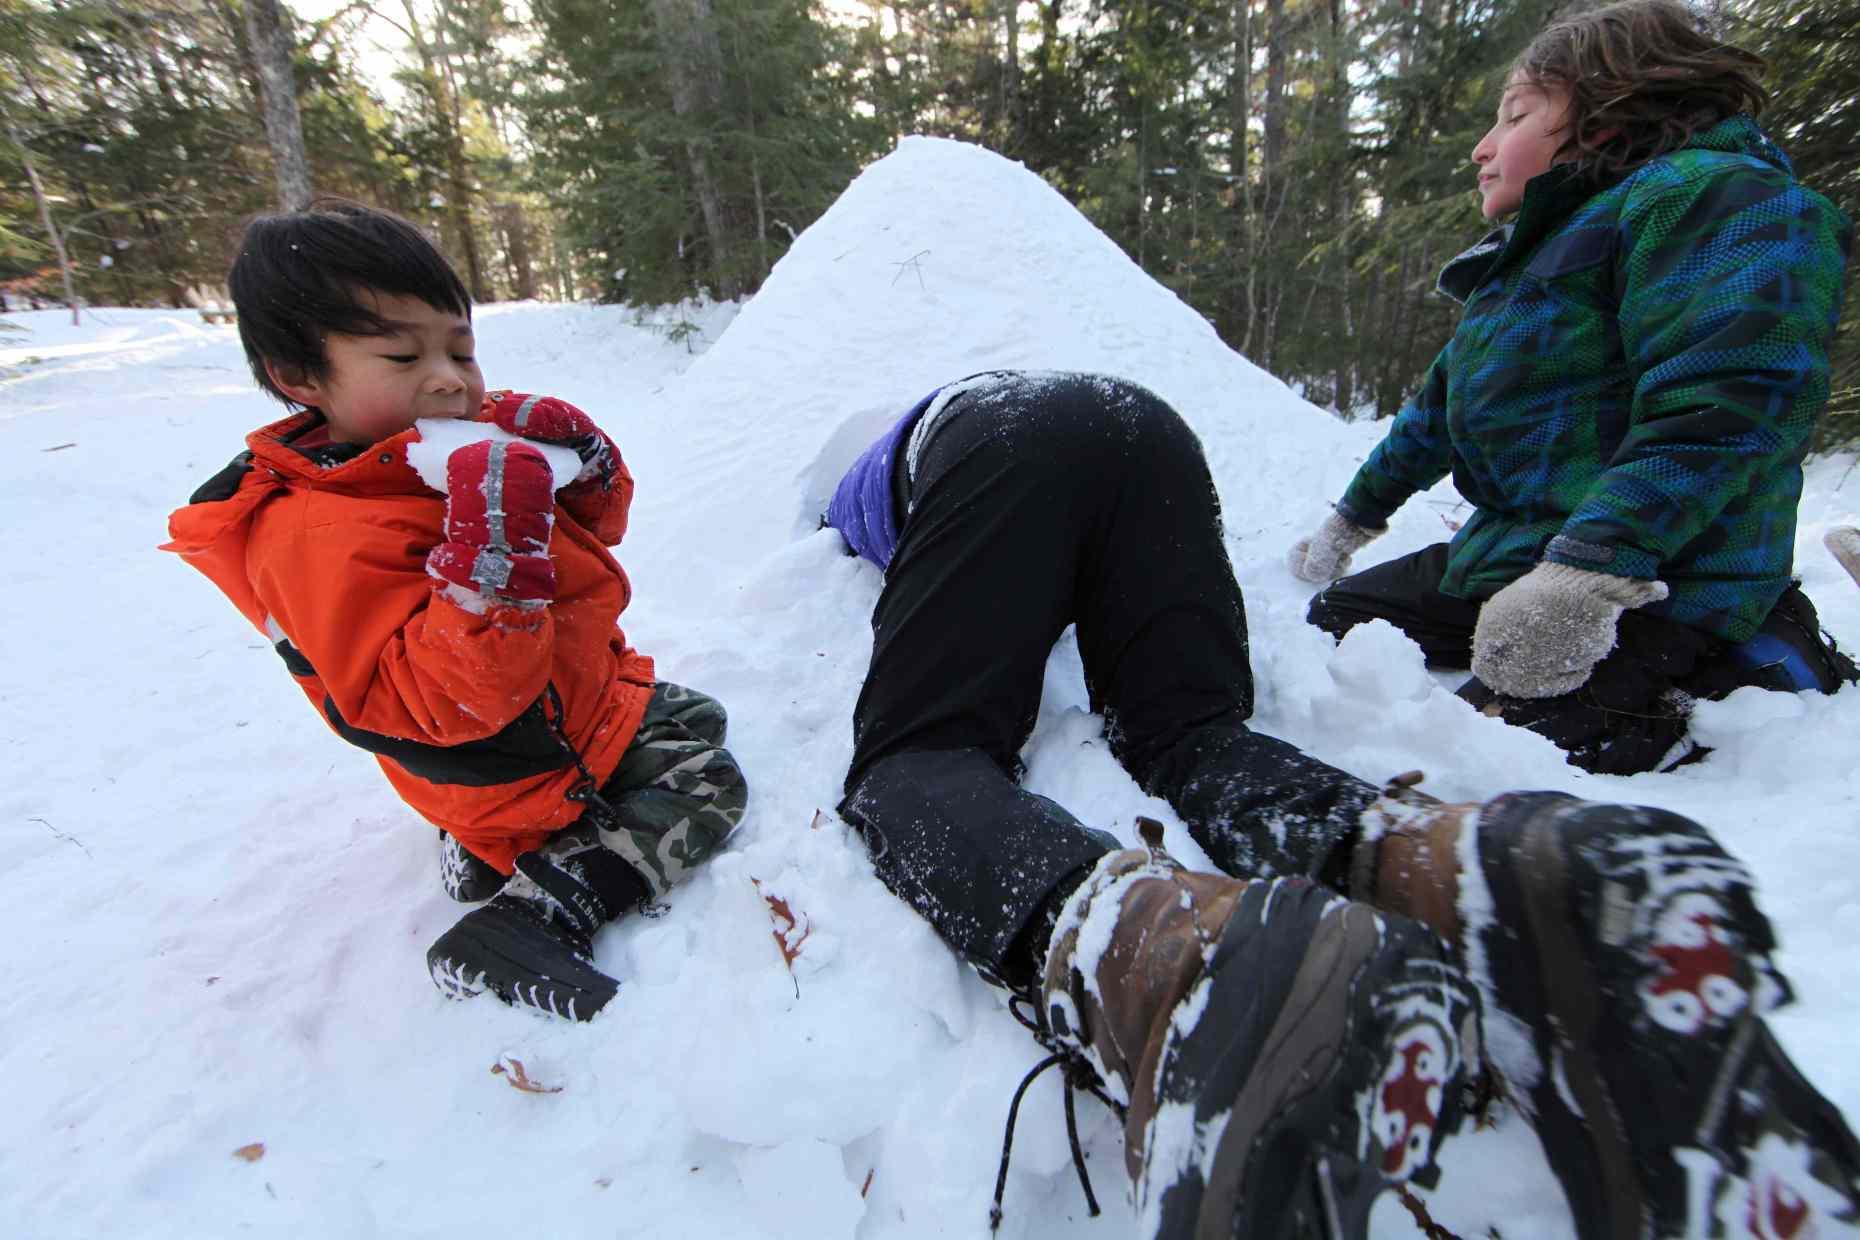 Excavating Snow From the Quinzhee, Photo © Liesl Clark